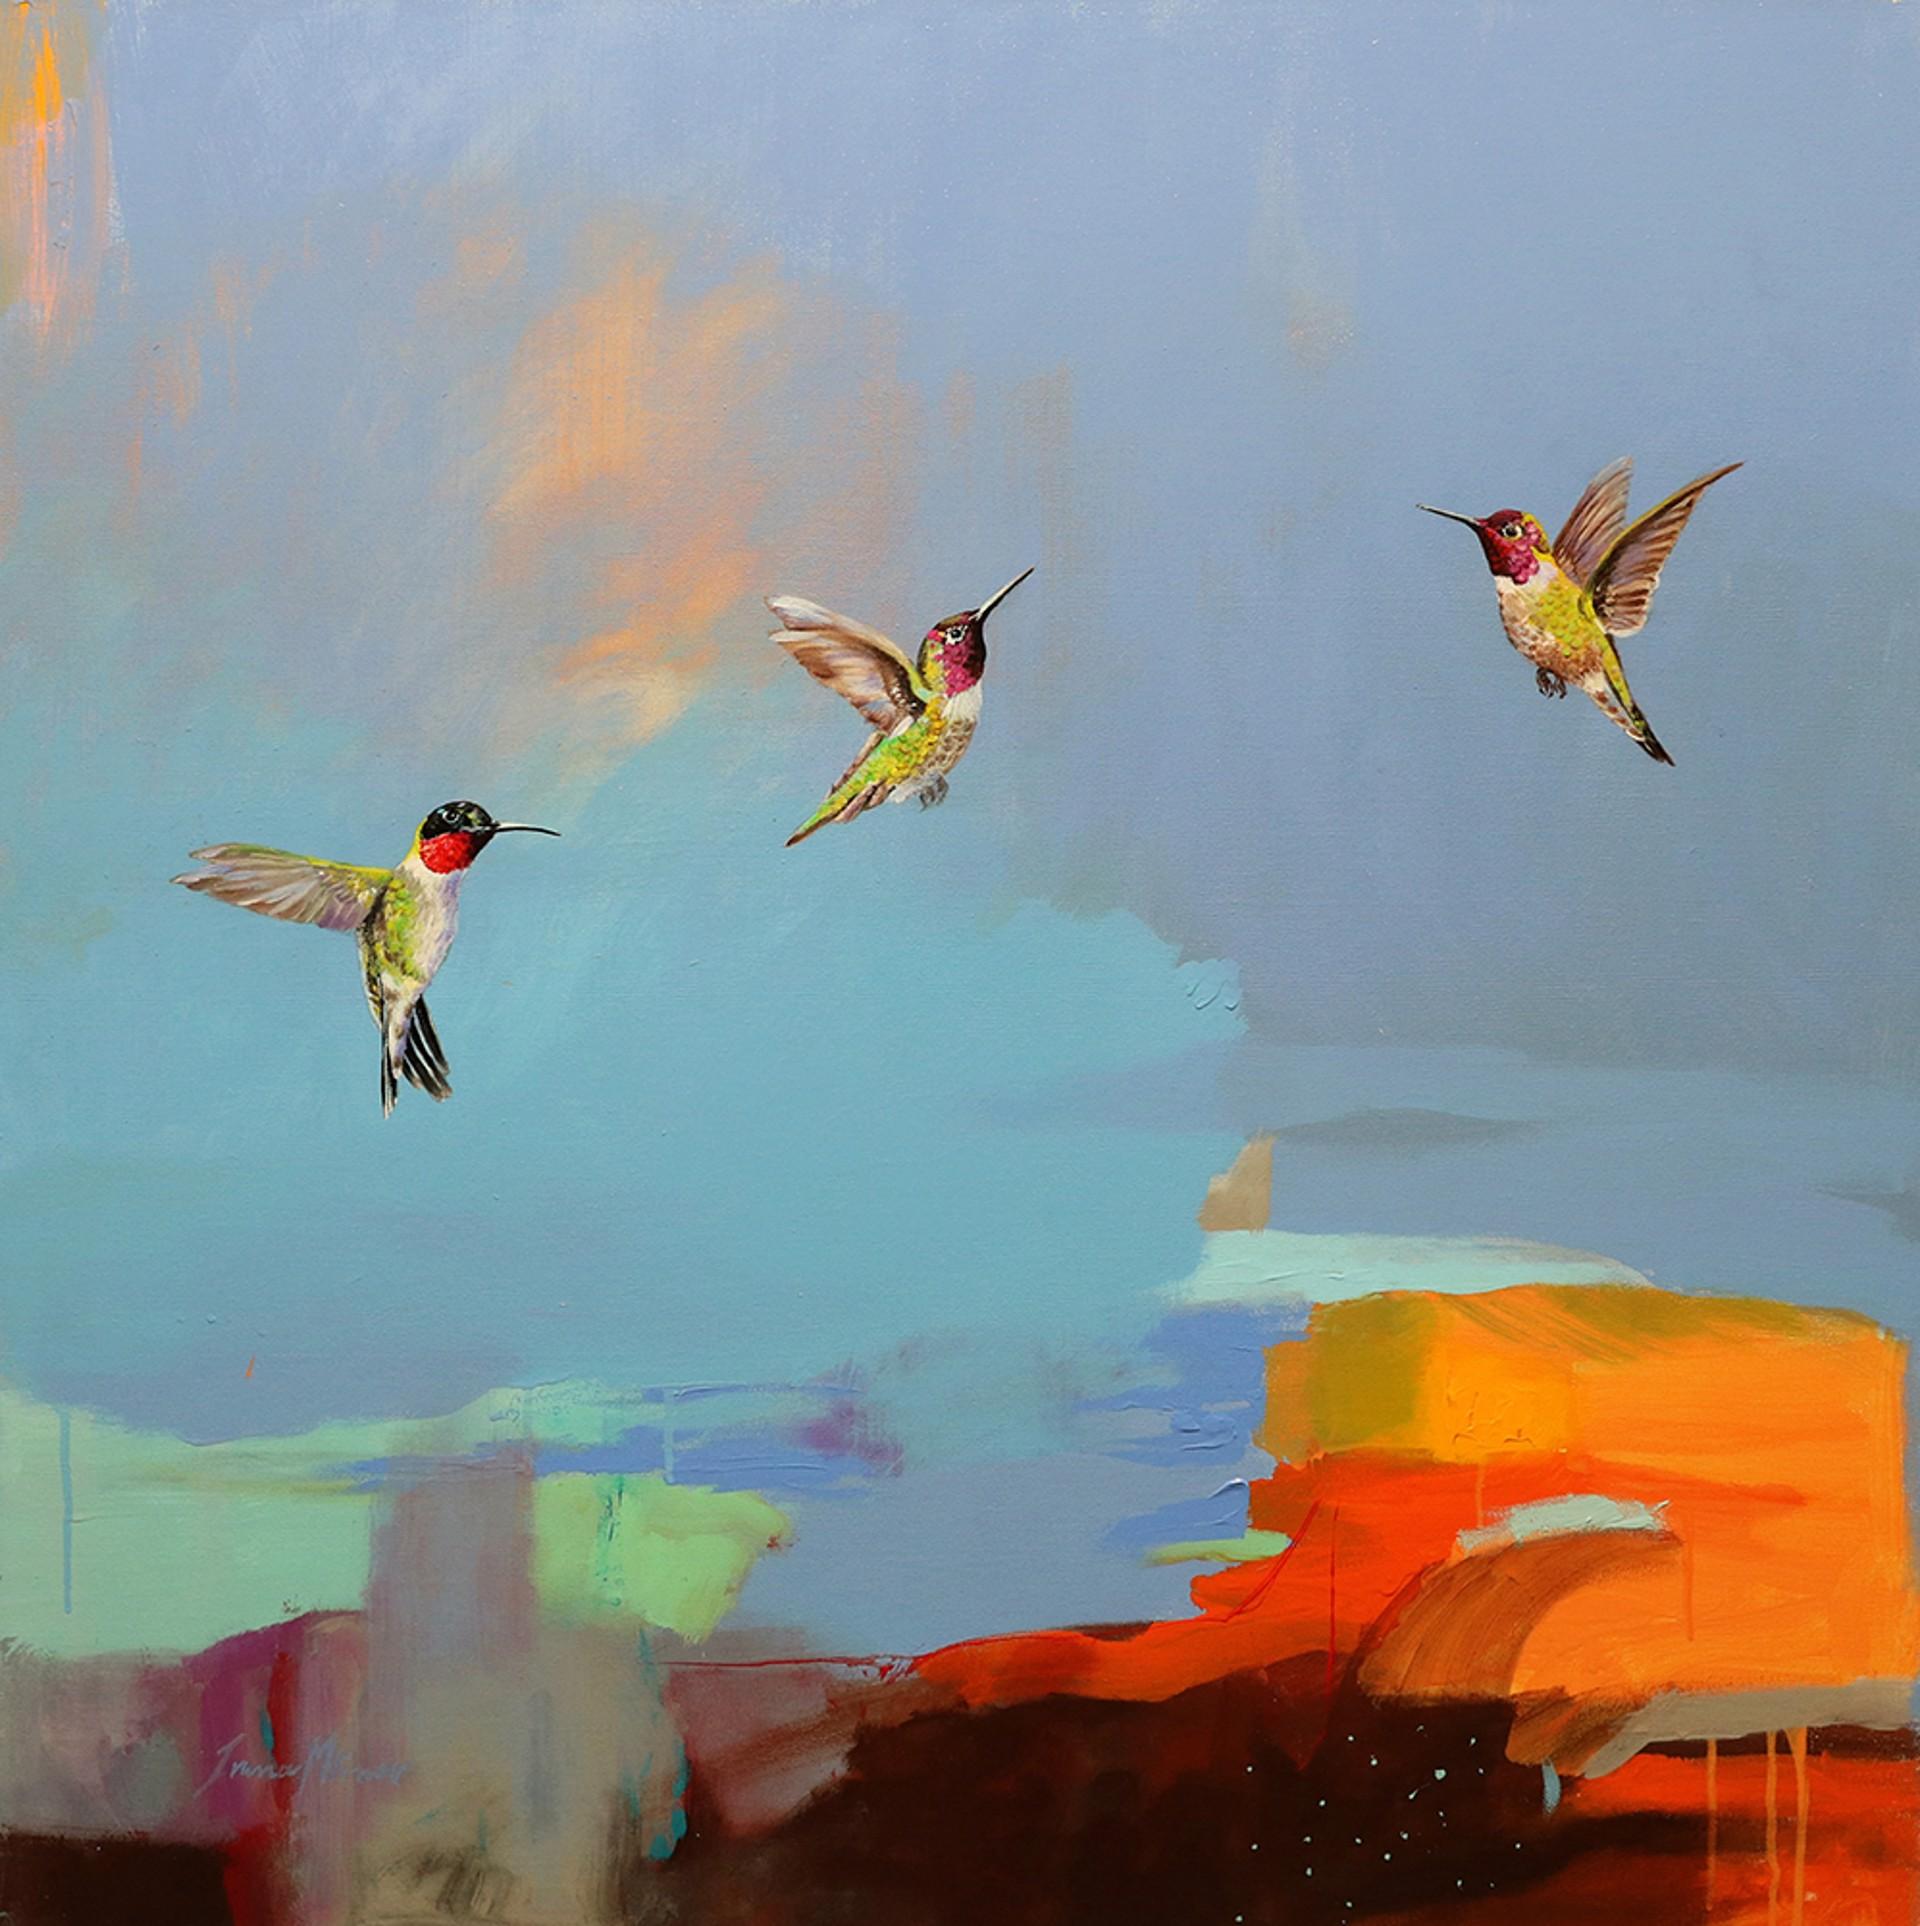 Flight Season by Ivana Mlinar